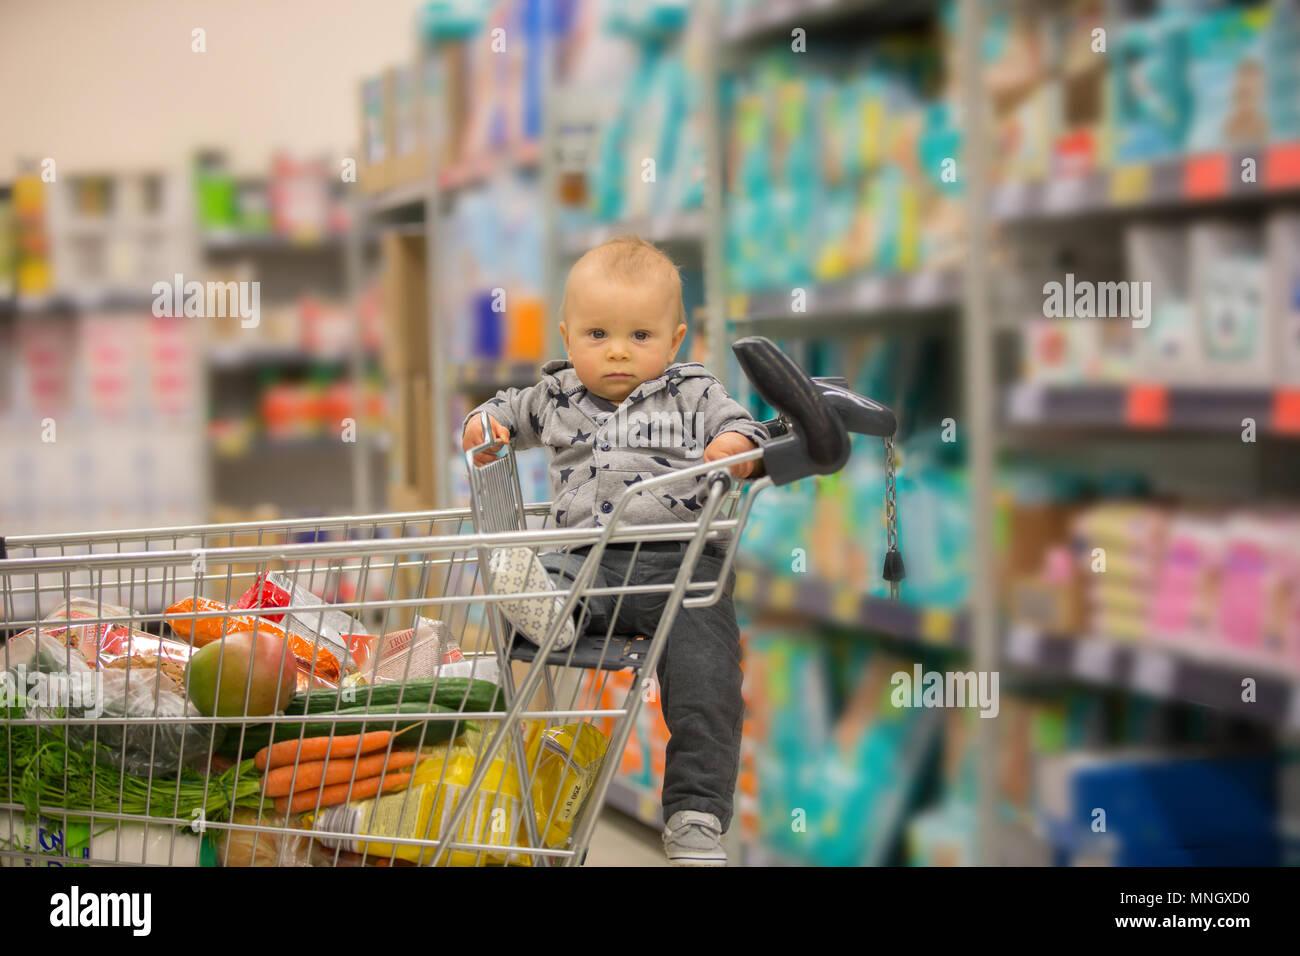 e8365b64c Toddler baby boy